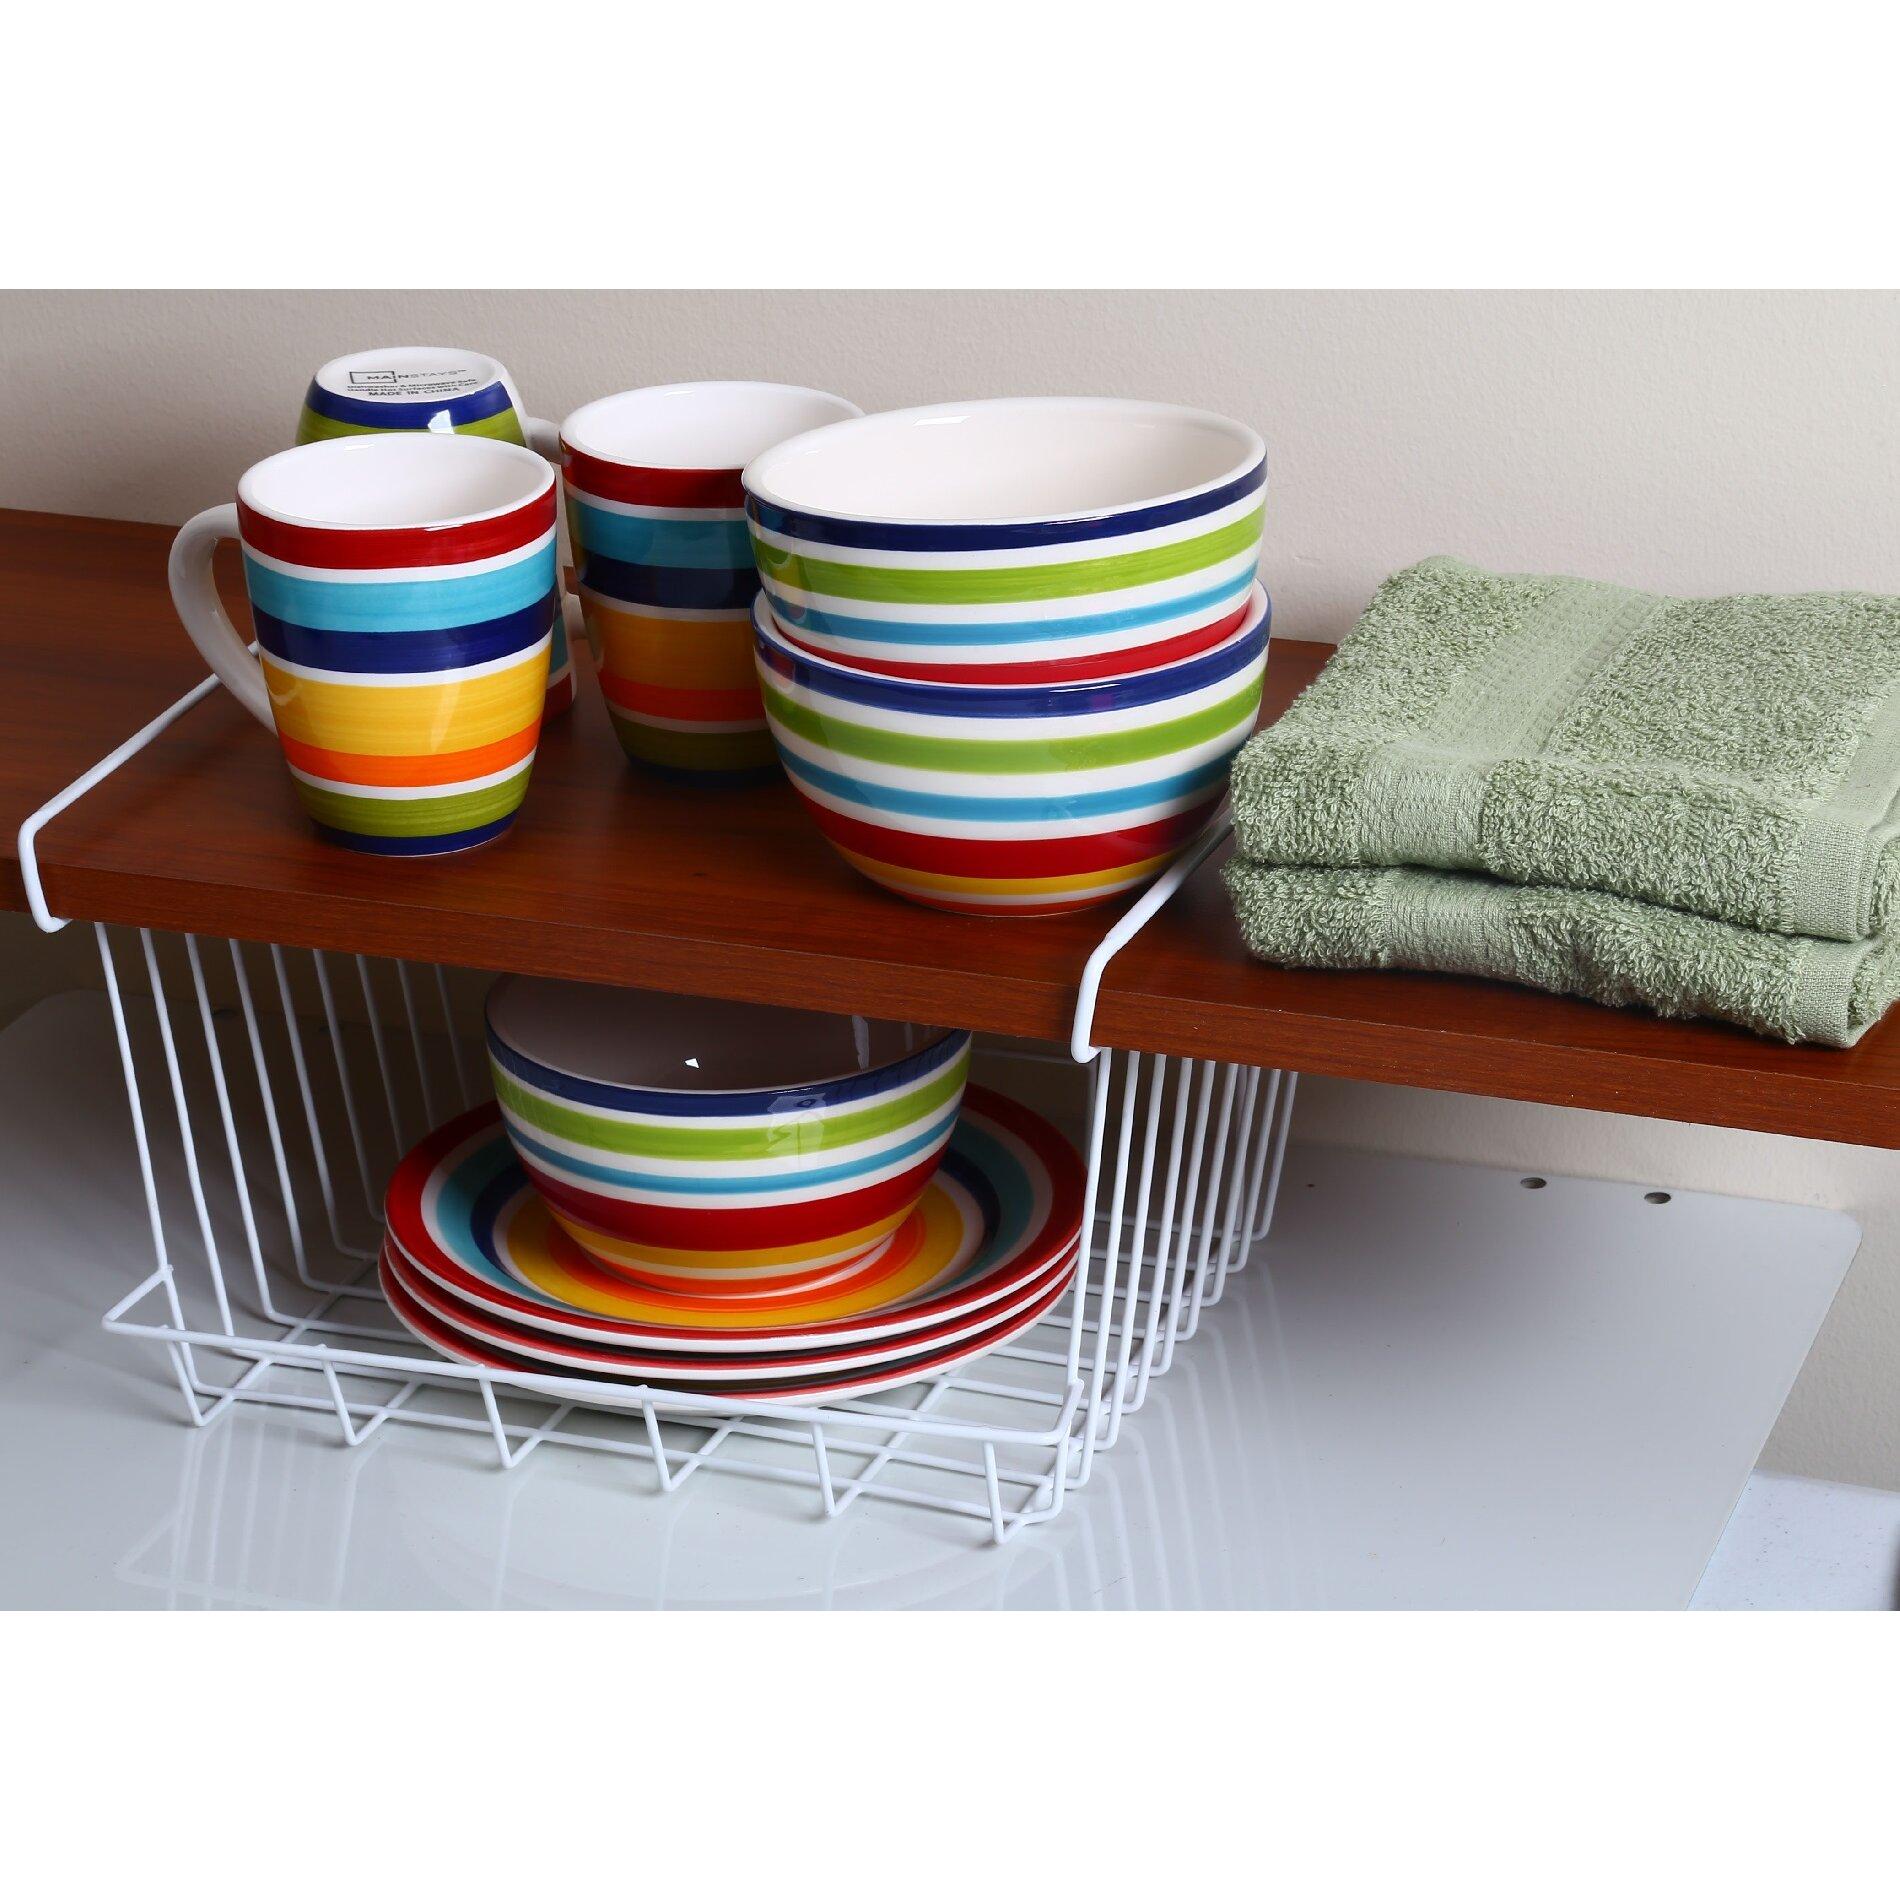 Ybm home under shelf storage organizer basket reviews for Under shelf basket wrap rack